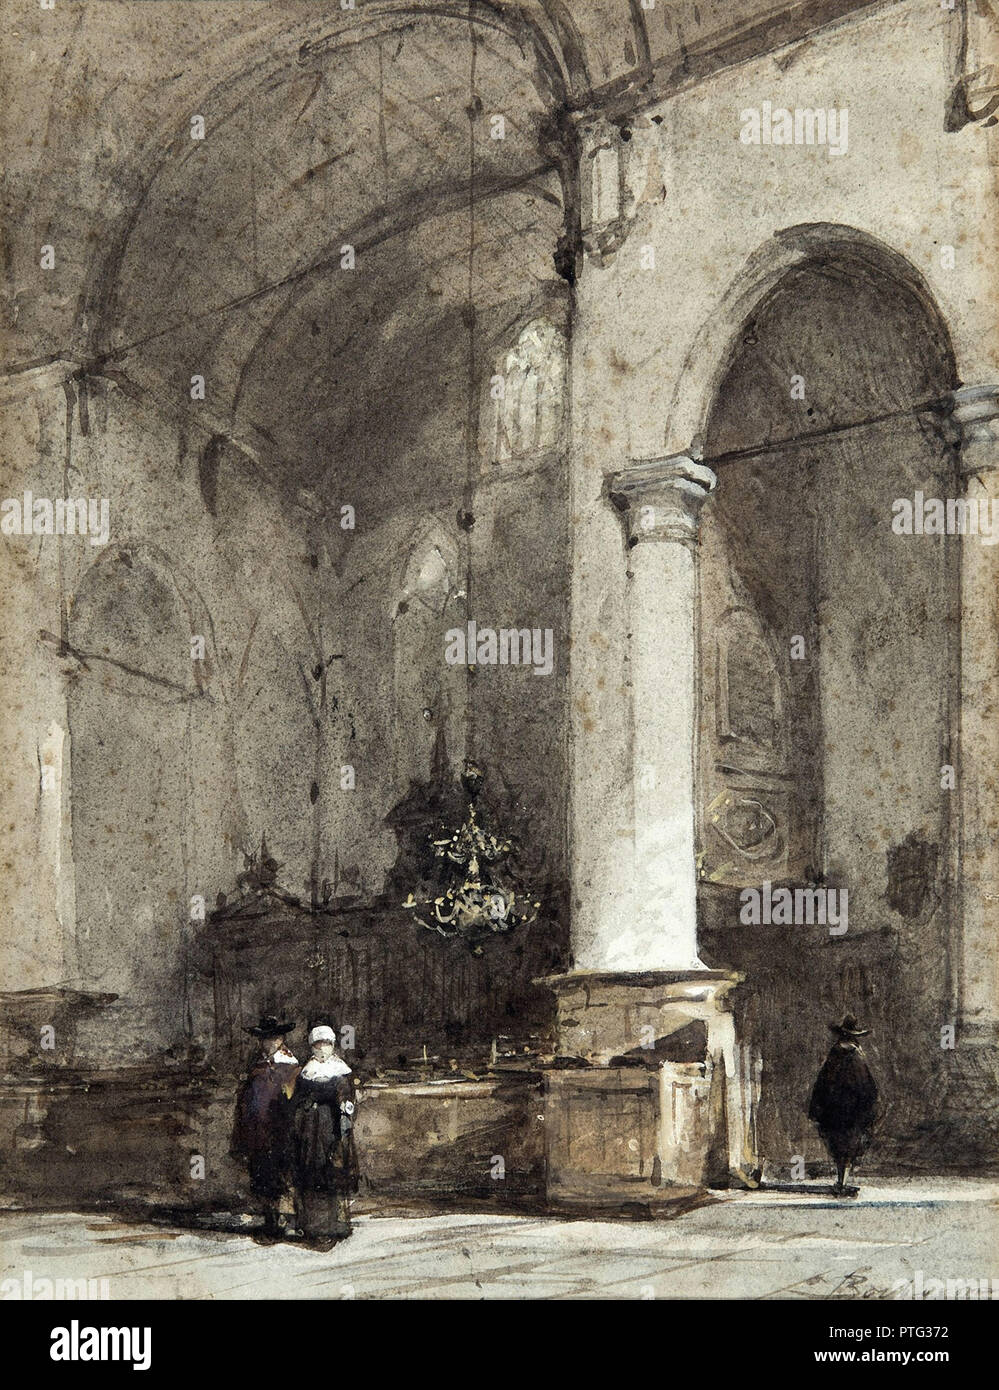 Bosboom  Johannes - Kerkinterieur Met Drie Personages - Stock Image